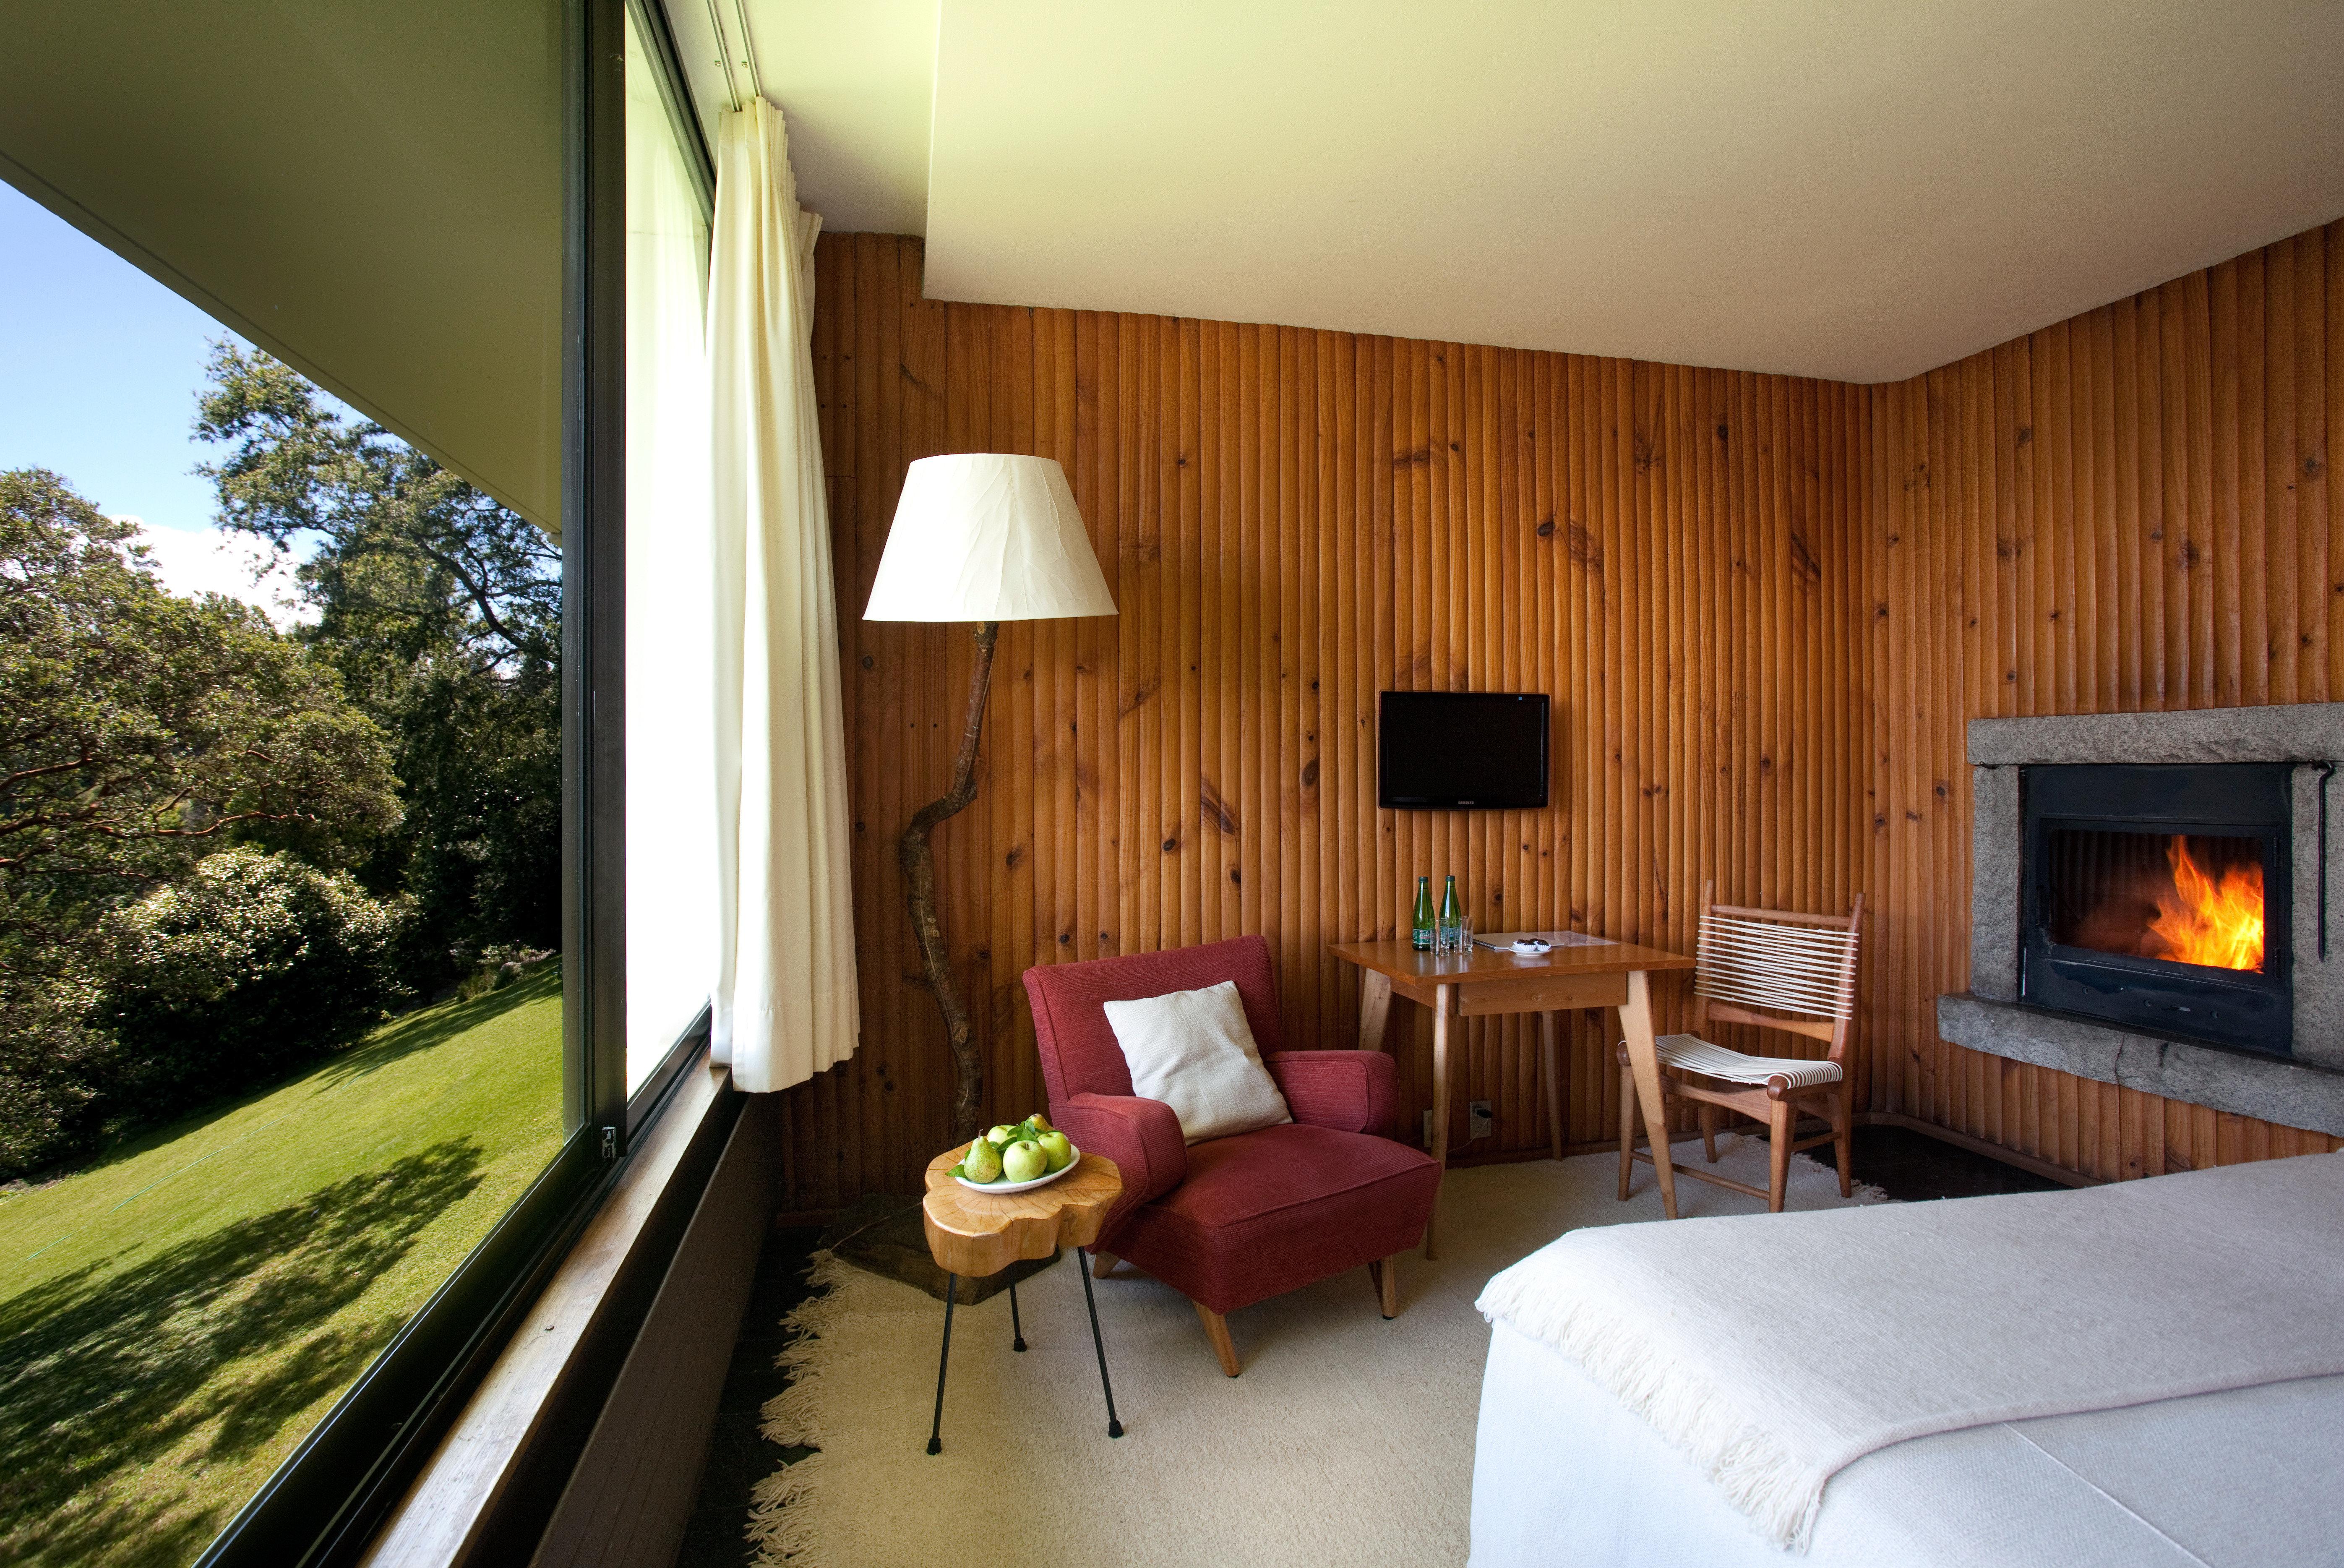 Bedroom Fireplace Luxury Modern Resort Scenic views property house home cottage Villa Suite living room condominium